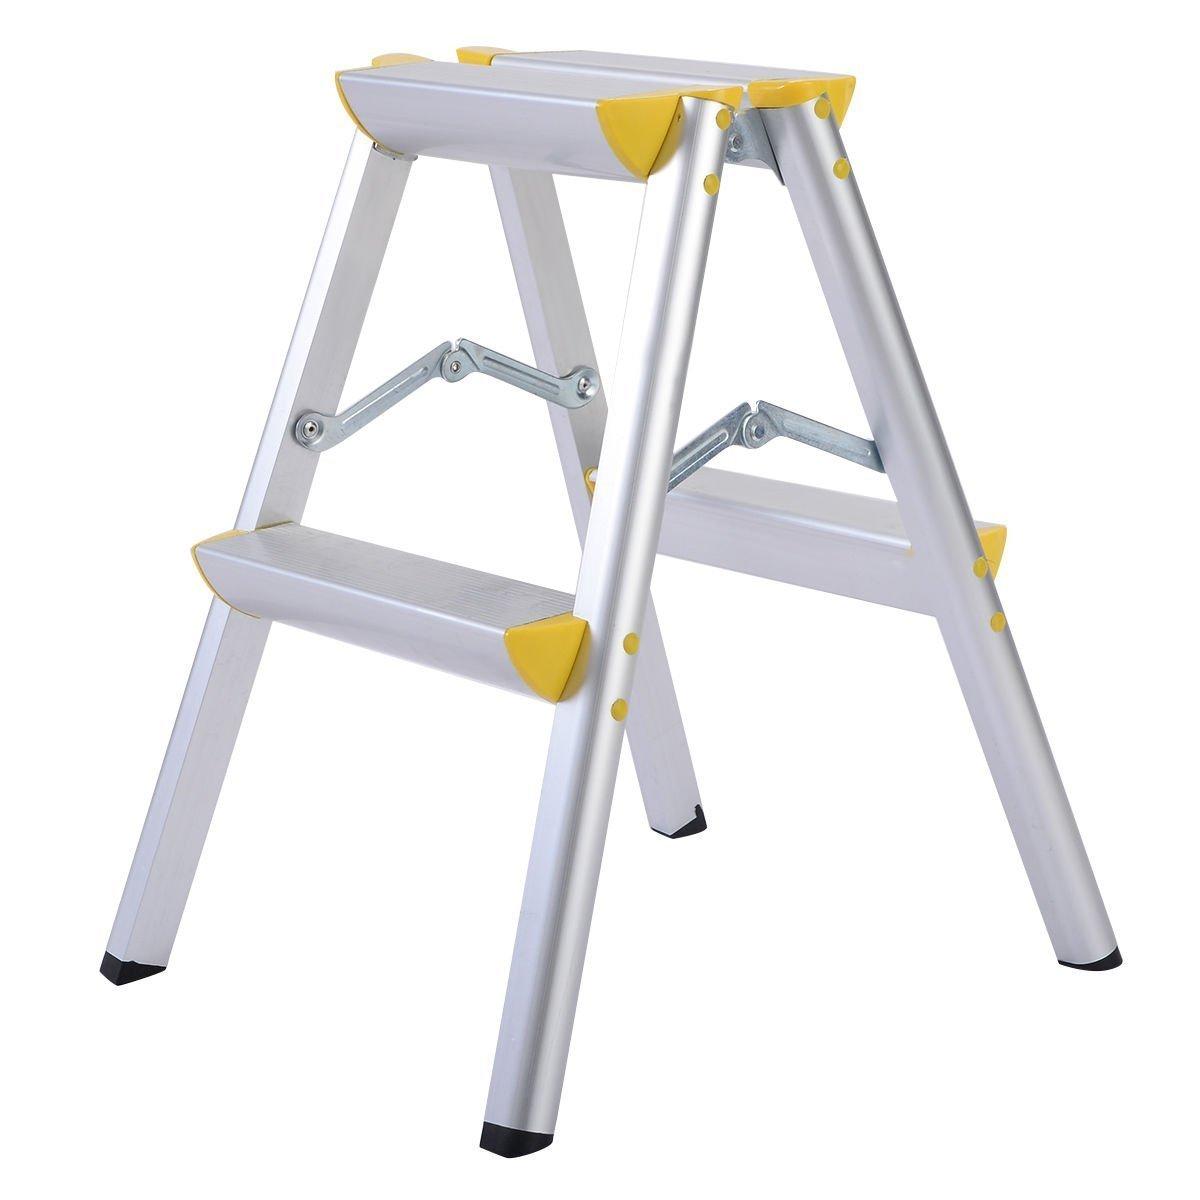 Giantex 2 Step Aluminum Ladder Folding Platform Work Stool 330 lbs Load Capacity